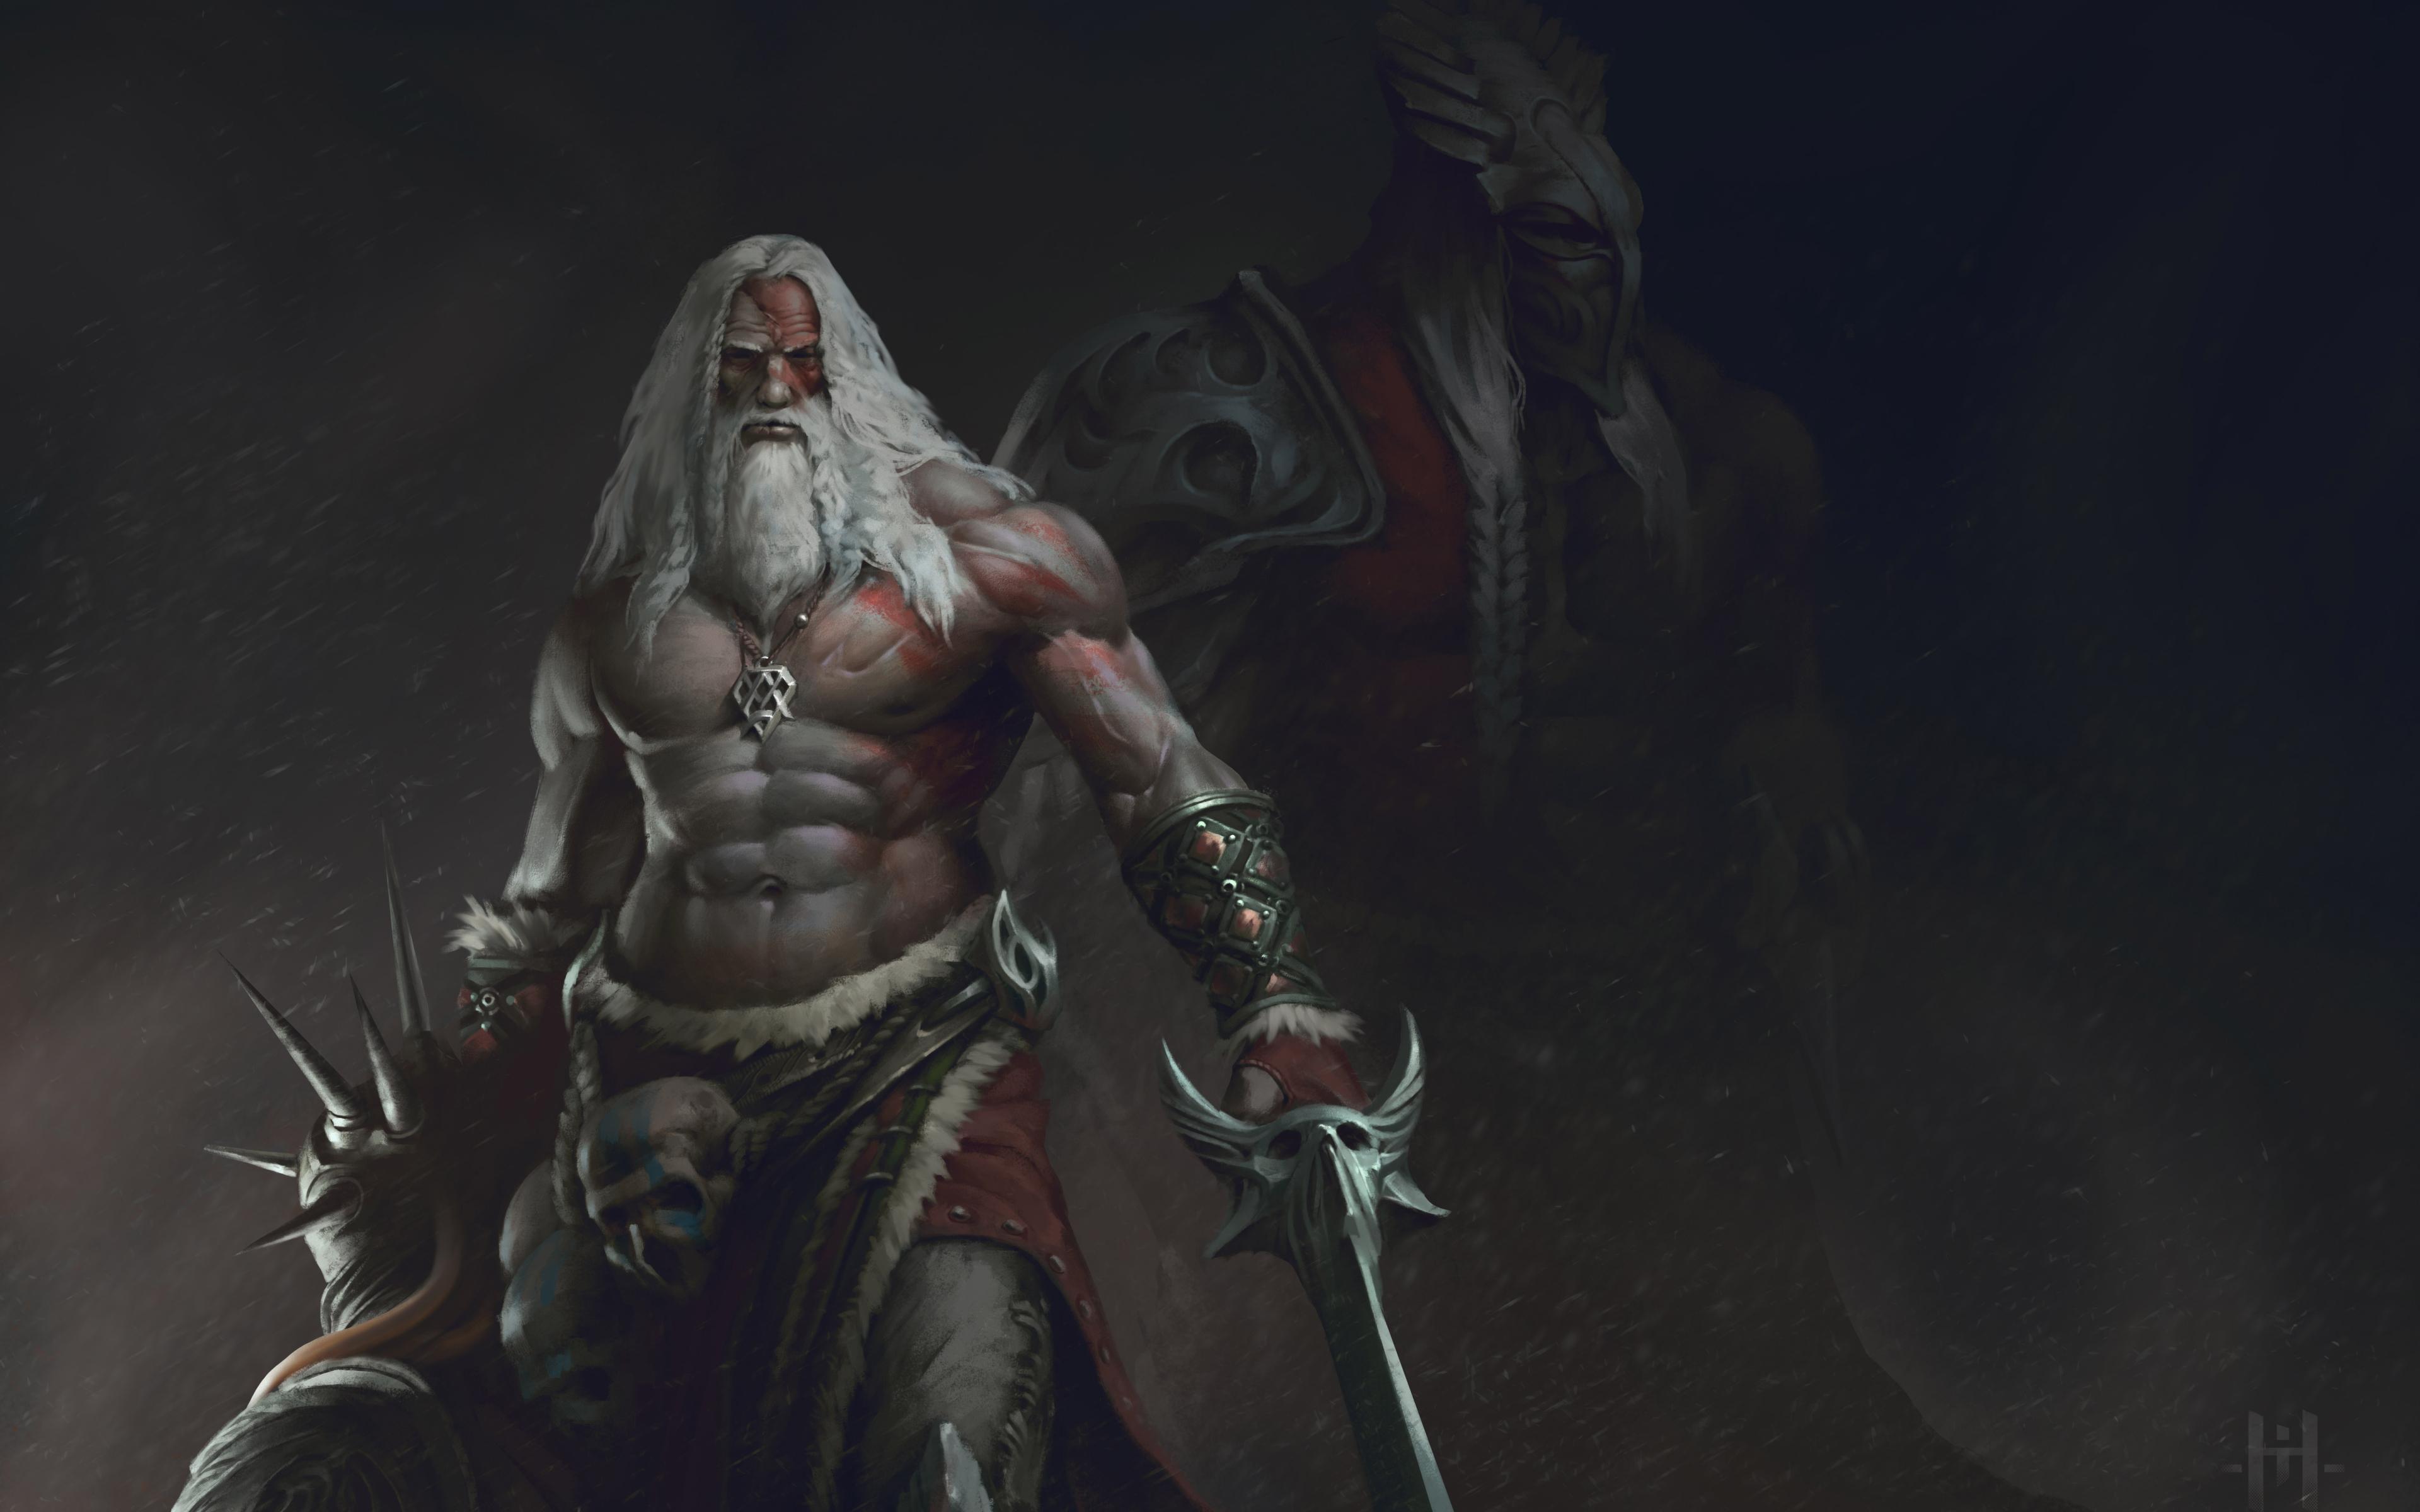 old beard man with sword warrior hd 8k wallpaper